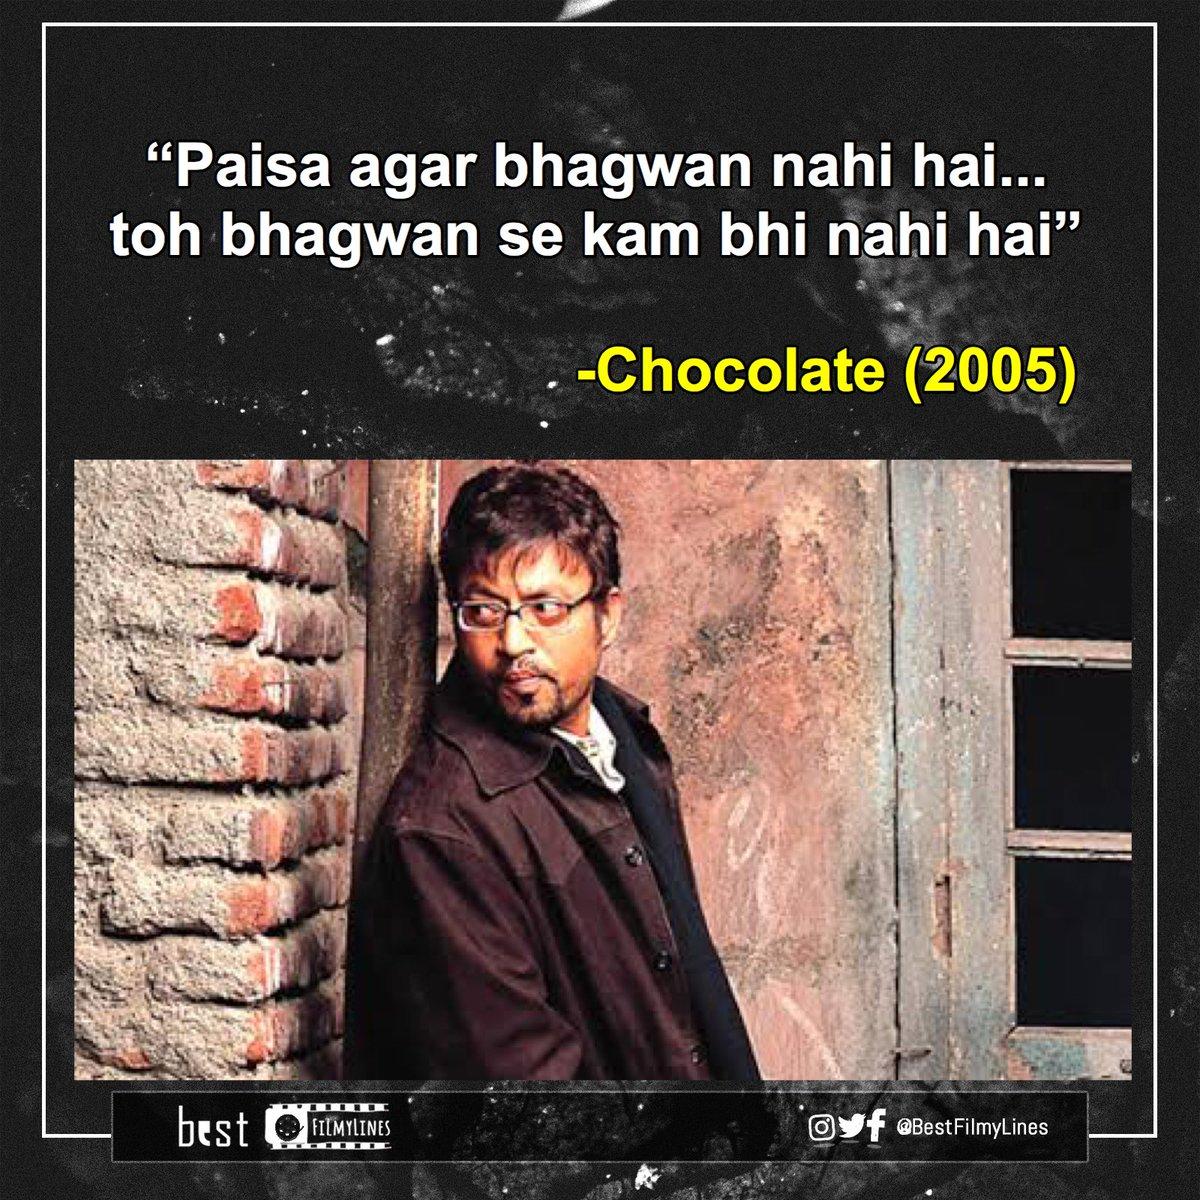 -Chocolate (2005), dir. Vivek Agnihotri  #IrfanKhan #IrrfanKhan #VivekAgnihotri #bollywood #bollywoodmovie #bollywoodmovies #bollywooddialogue #indiancinema #hindi #hindimovie #dialogue #dialogues #quote #quotes #bestfilmylines https://t.co/3flWTCu6dM